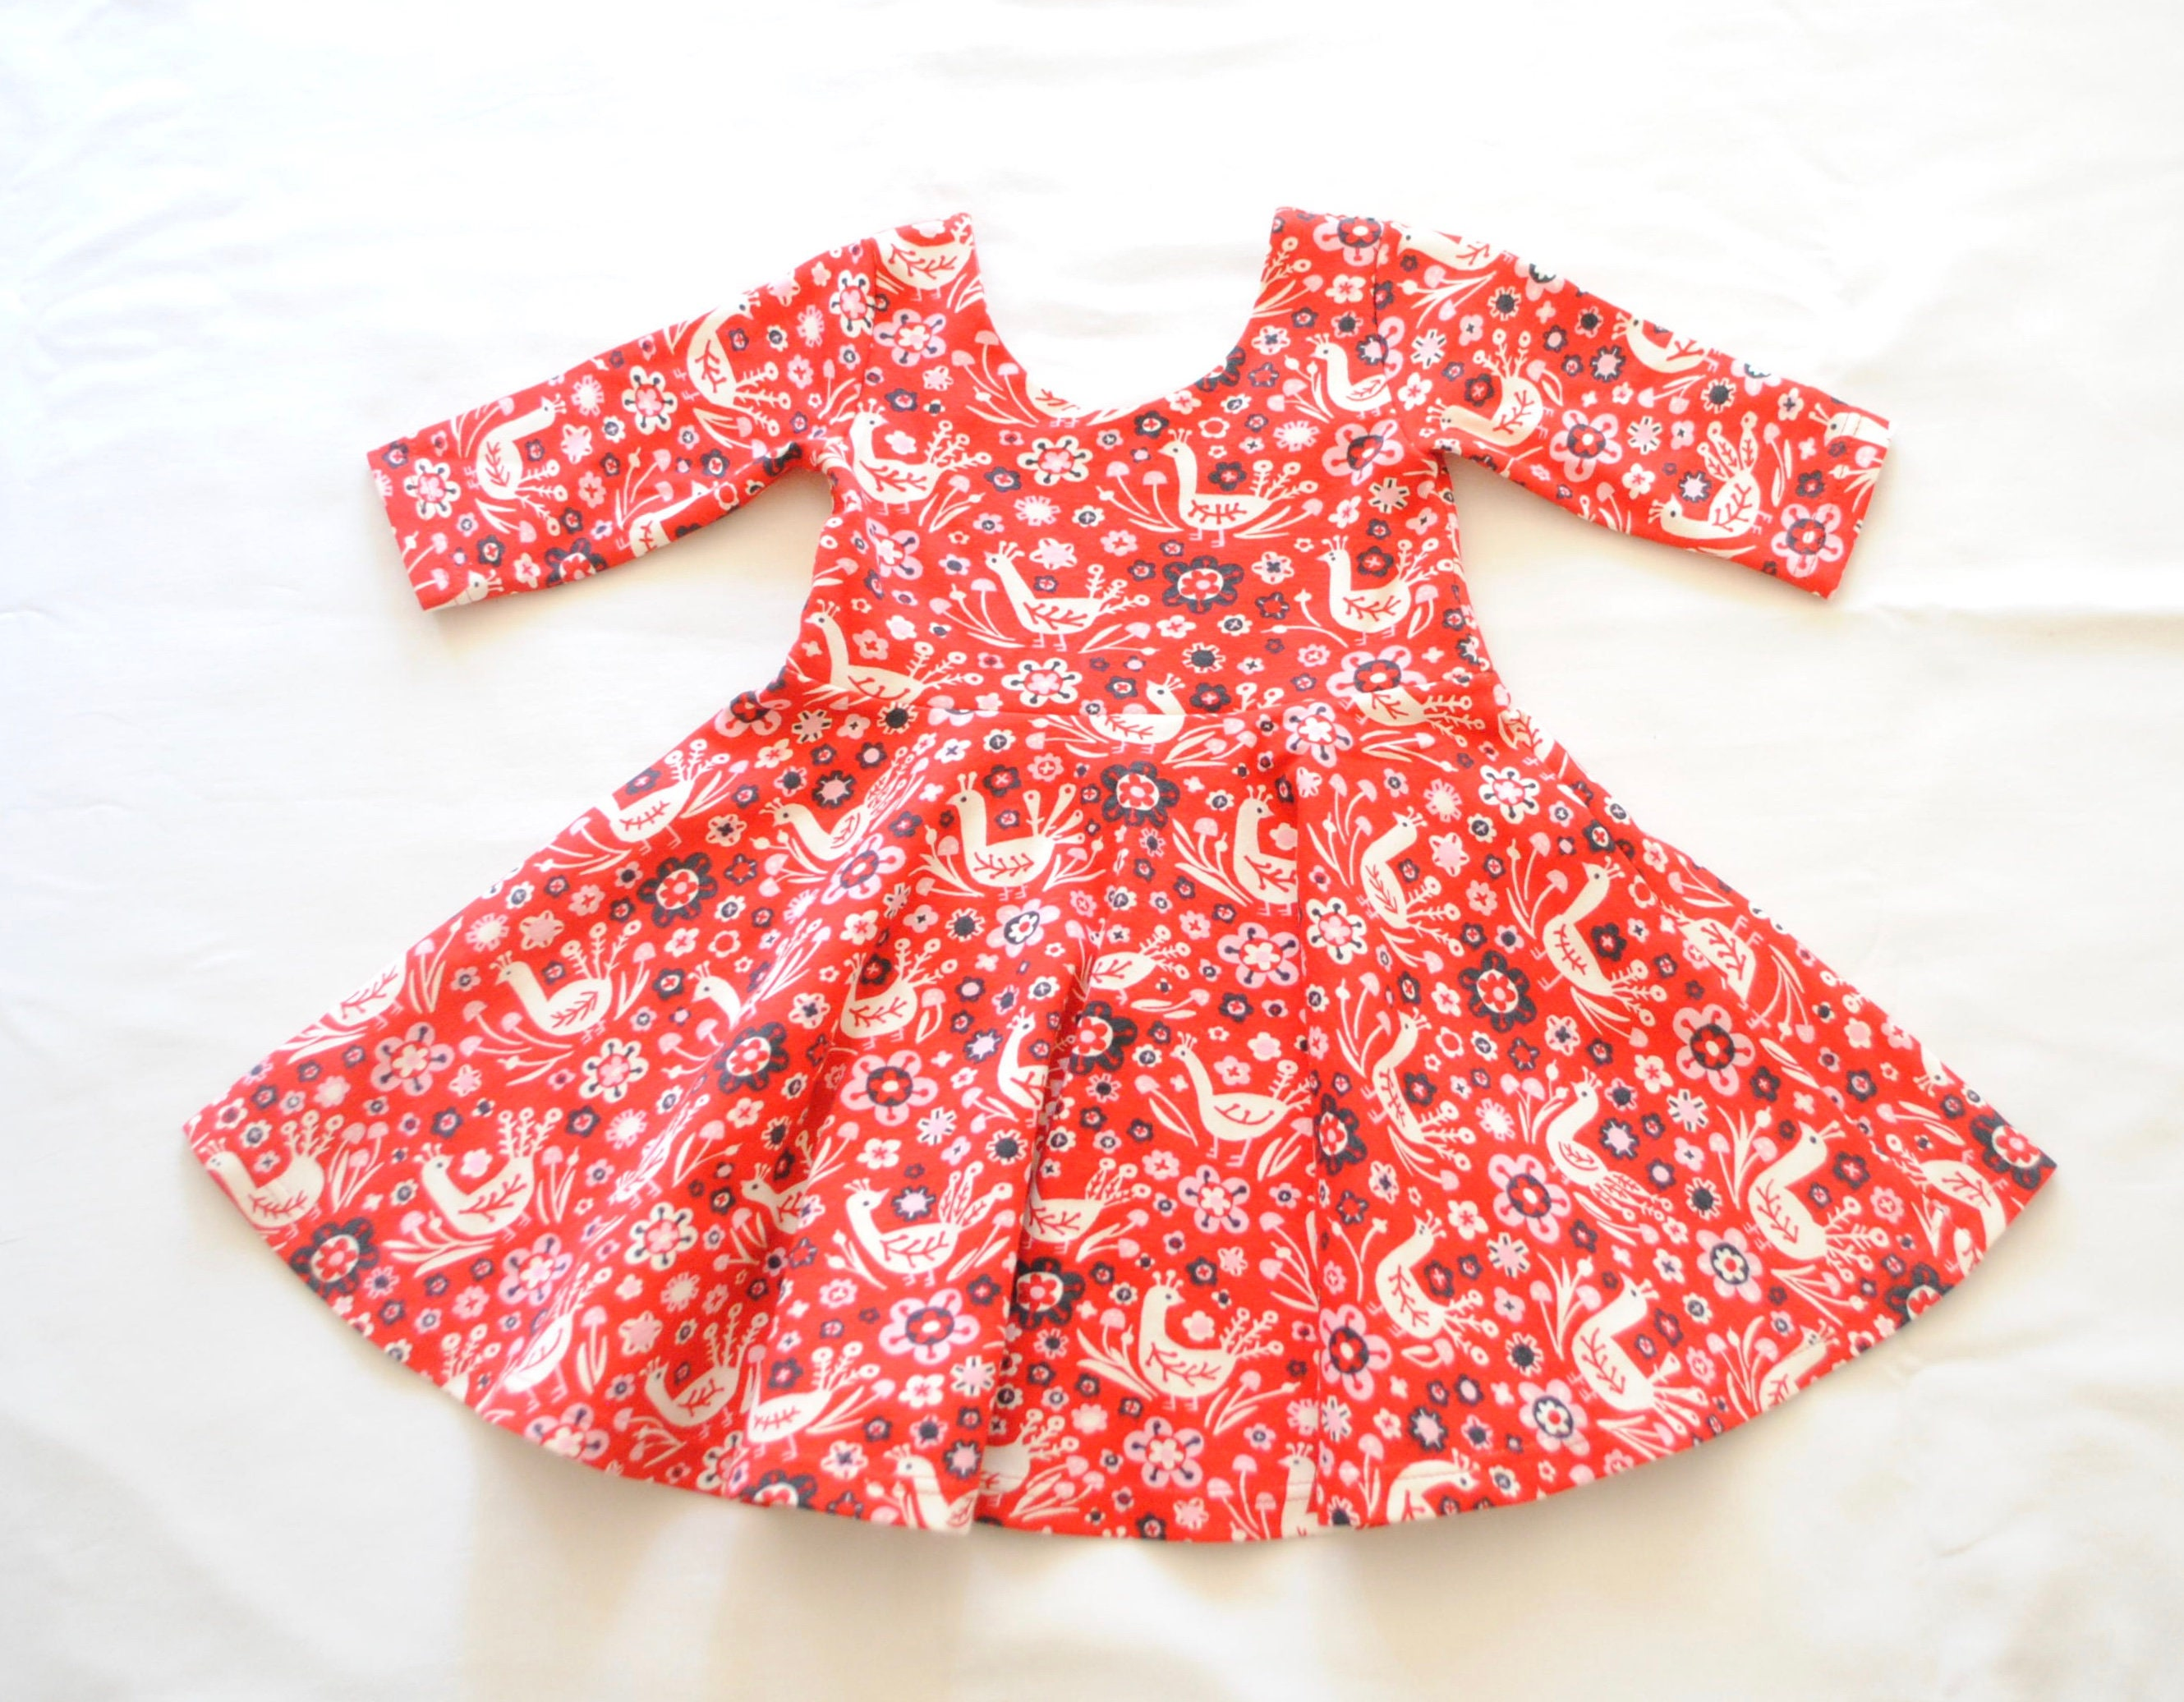 bae856acb98 Organic Baby DressOrganic Toddler DressBirch Organic Twirl